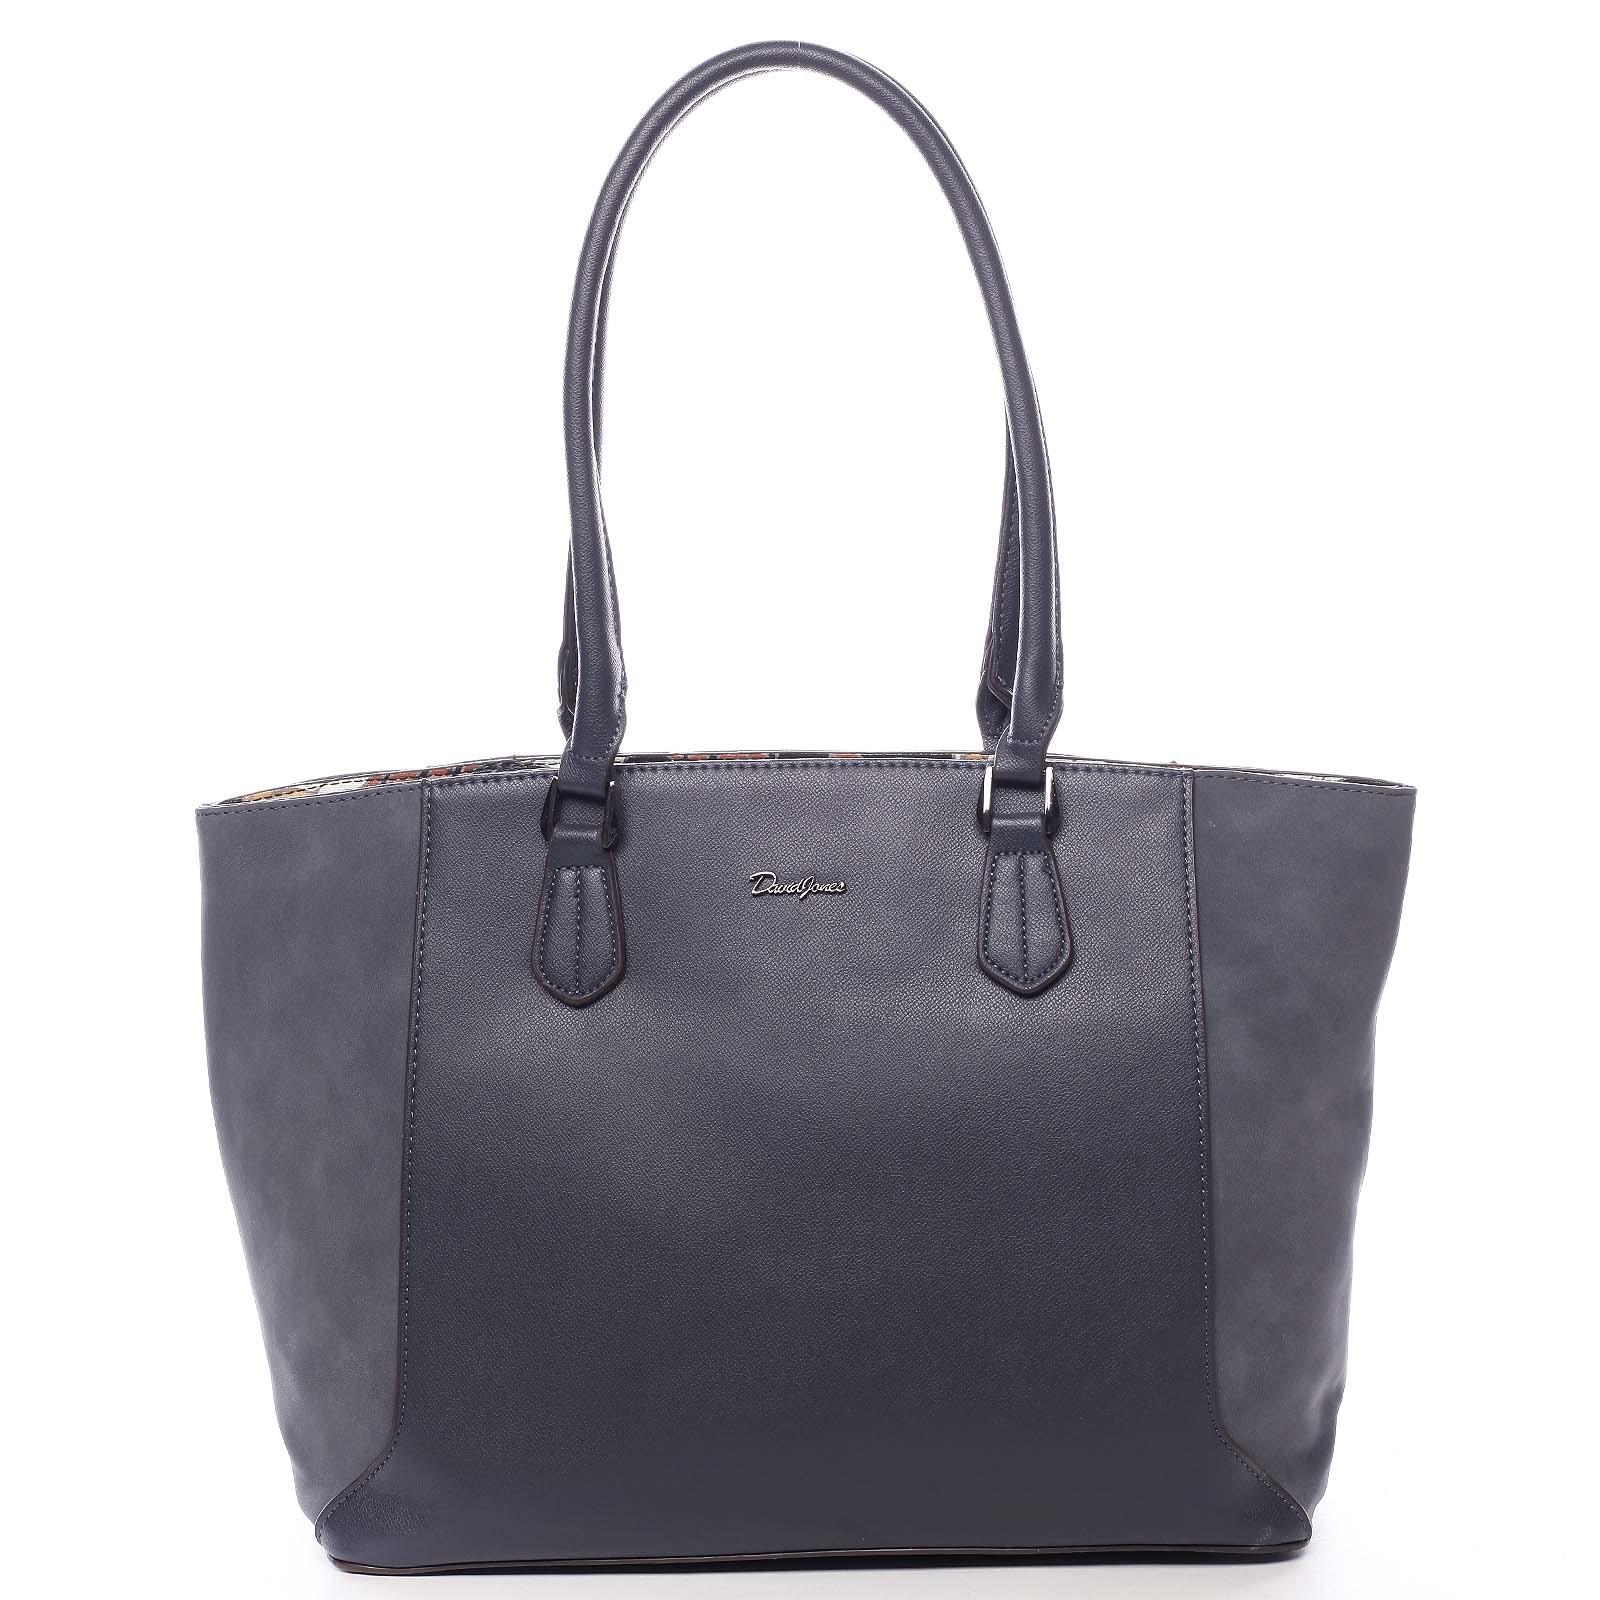 Veľká dámska kabelka cez rameno tmavo modrá - David Jones Matter modrá